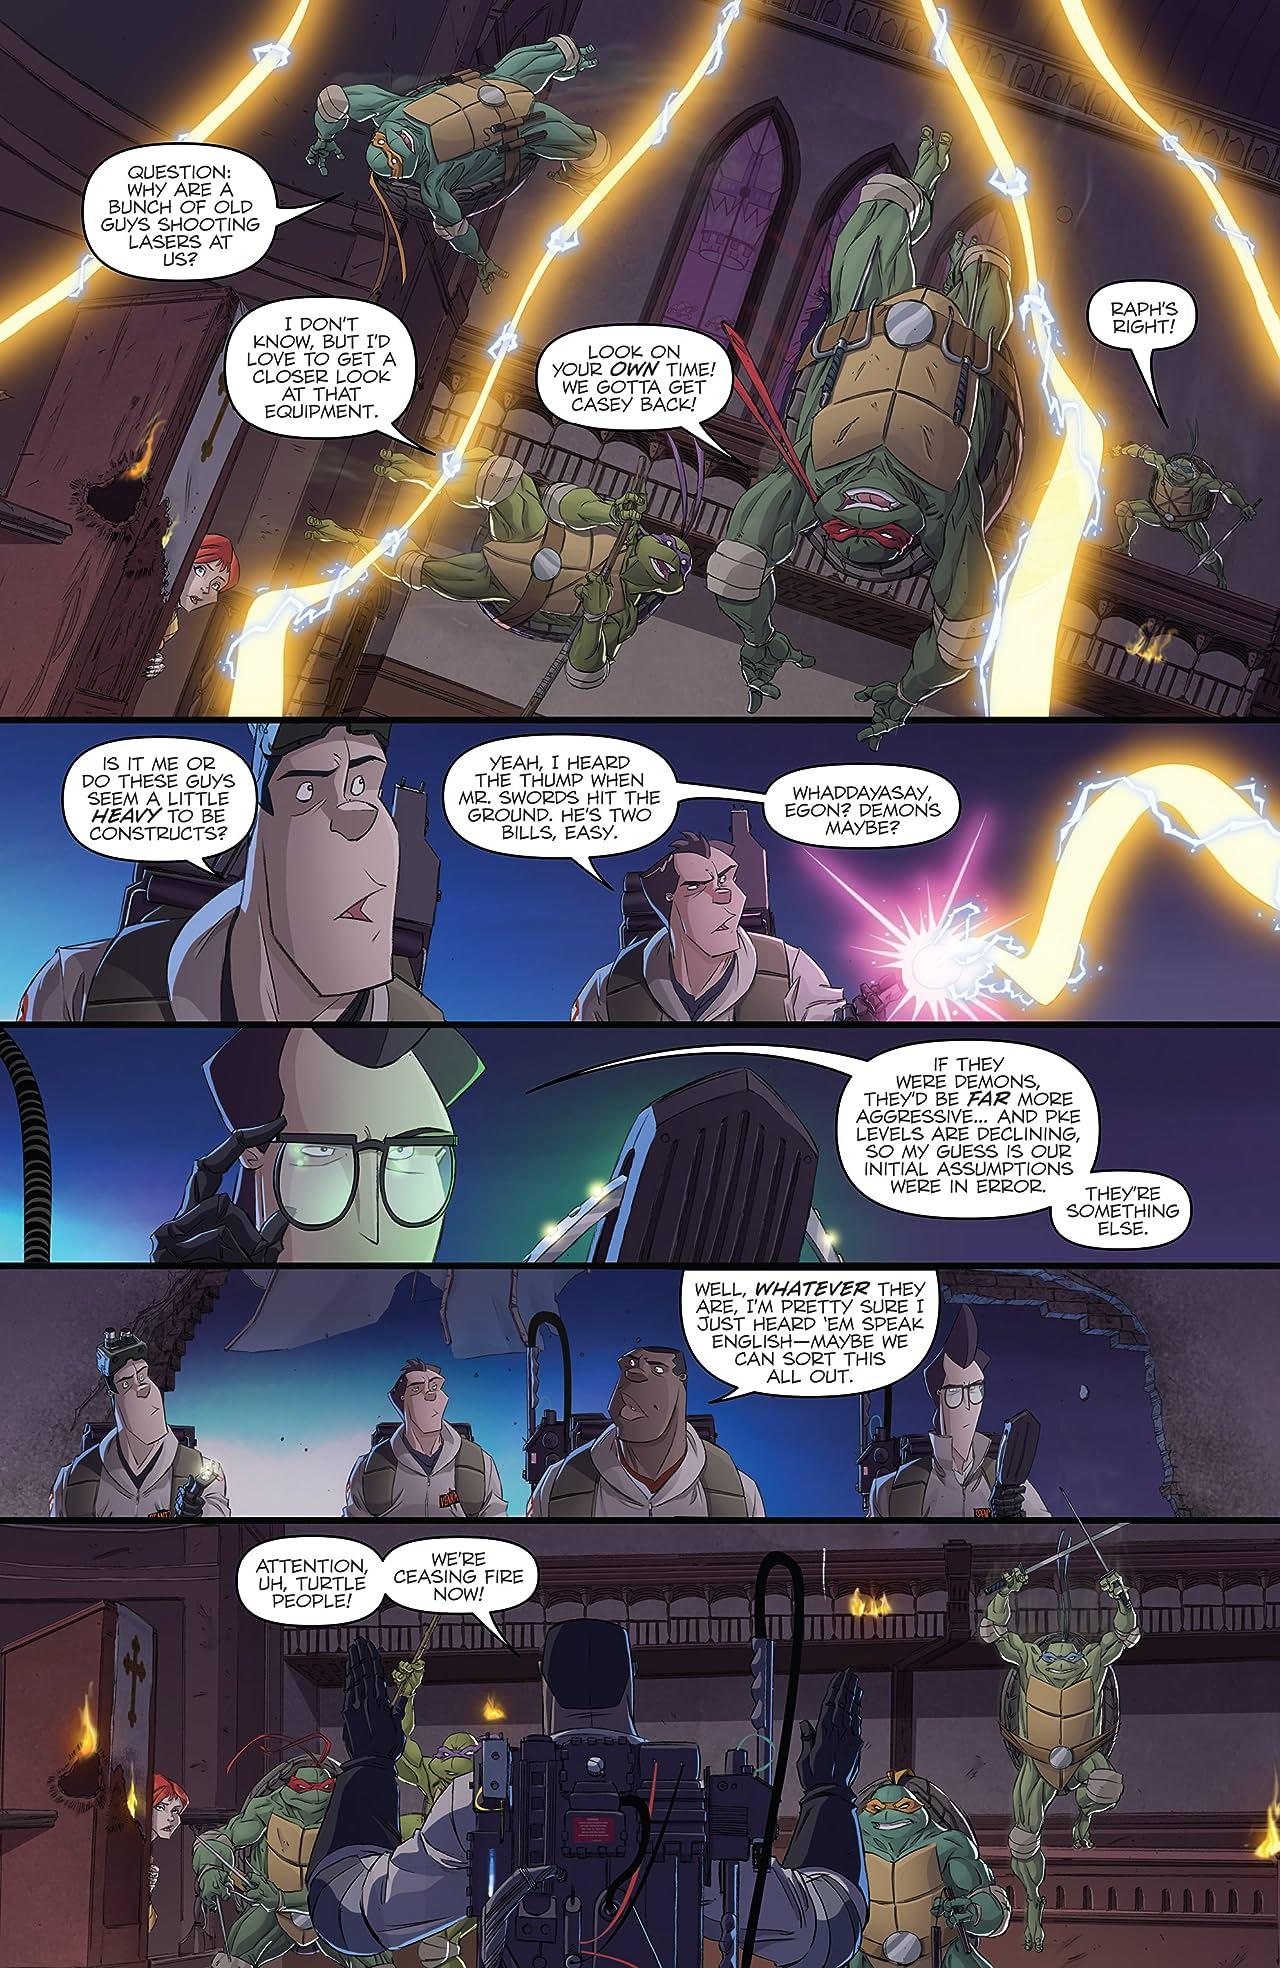 Teenage Mutant Ninja Turtles/Ghostbusters #2 (of 4)